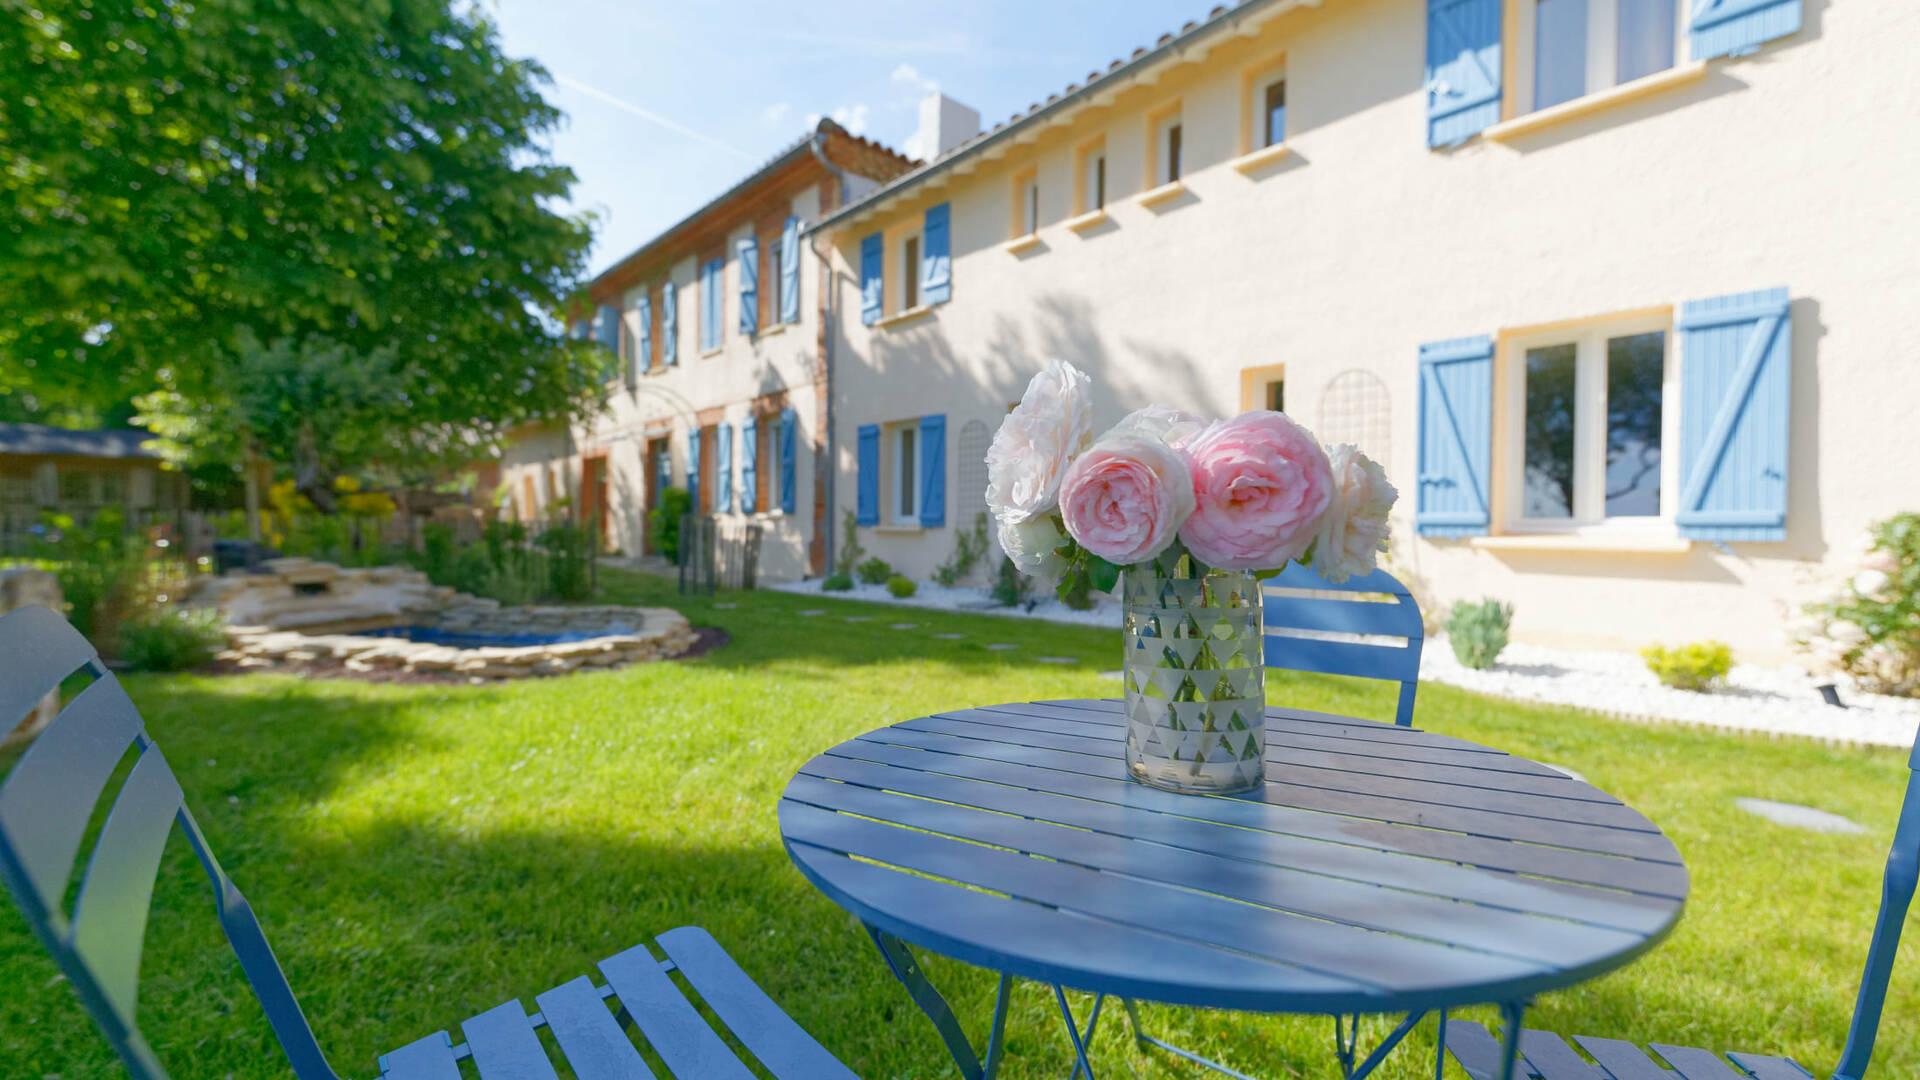 Gite La Maison Bleue, Savignac-Mona, Lombez, Samatan, Savès, Gascogne, Gers, France